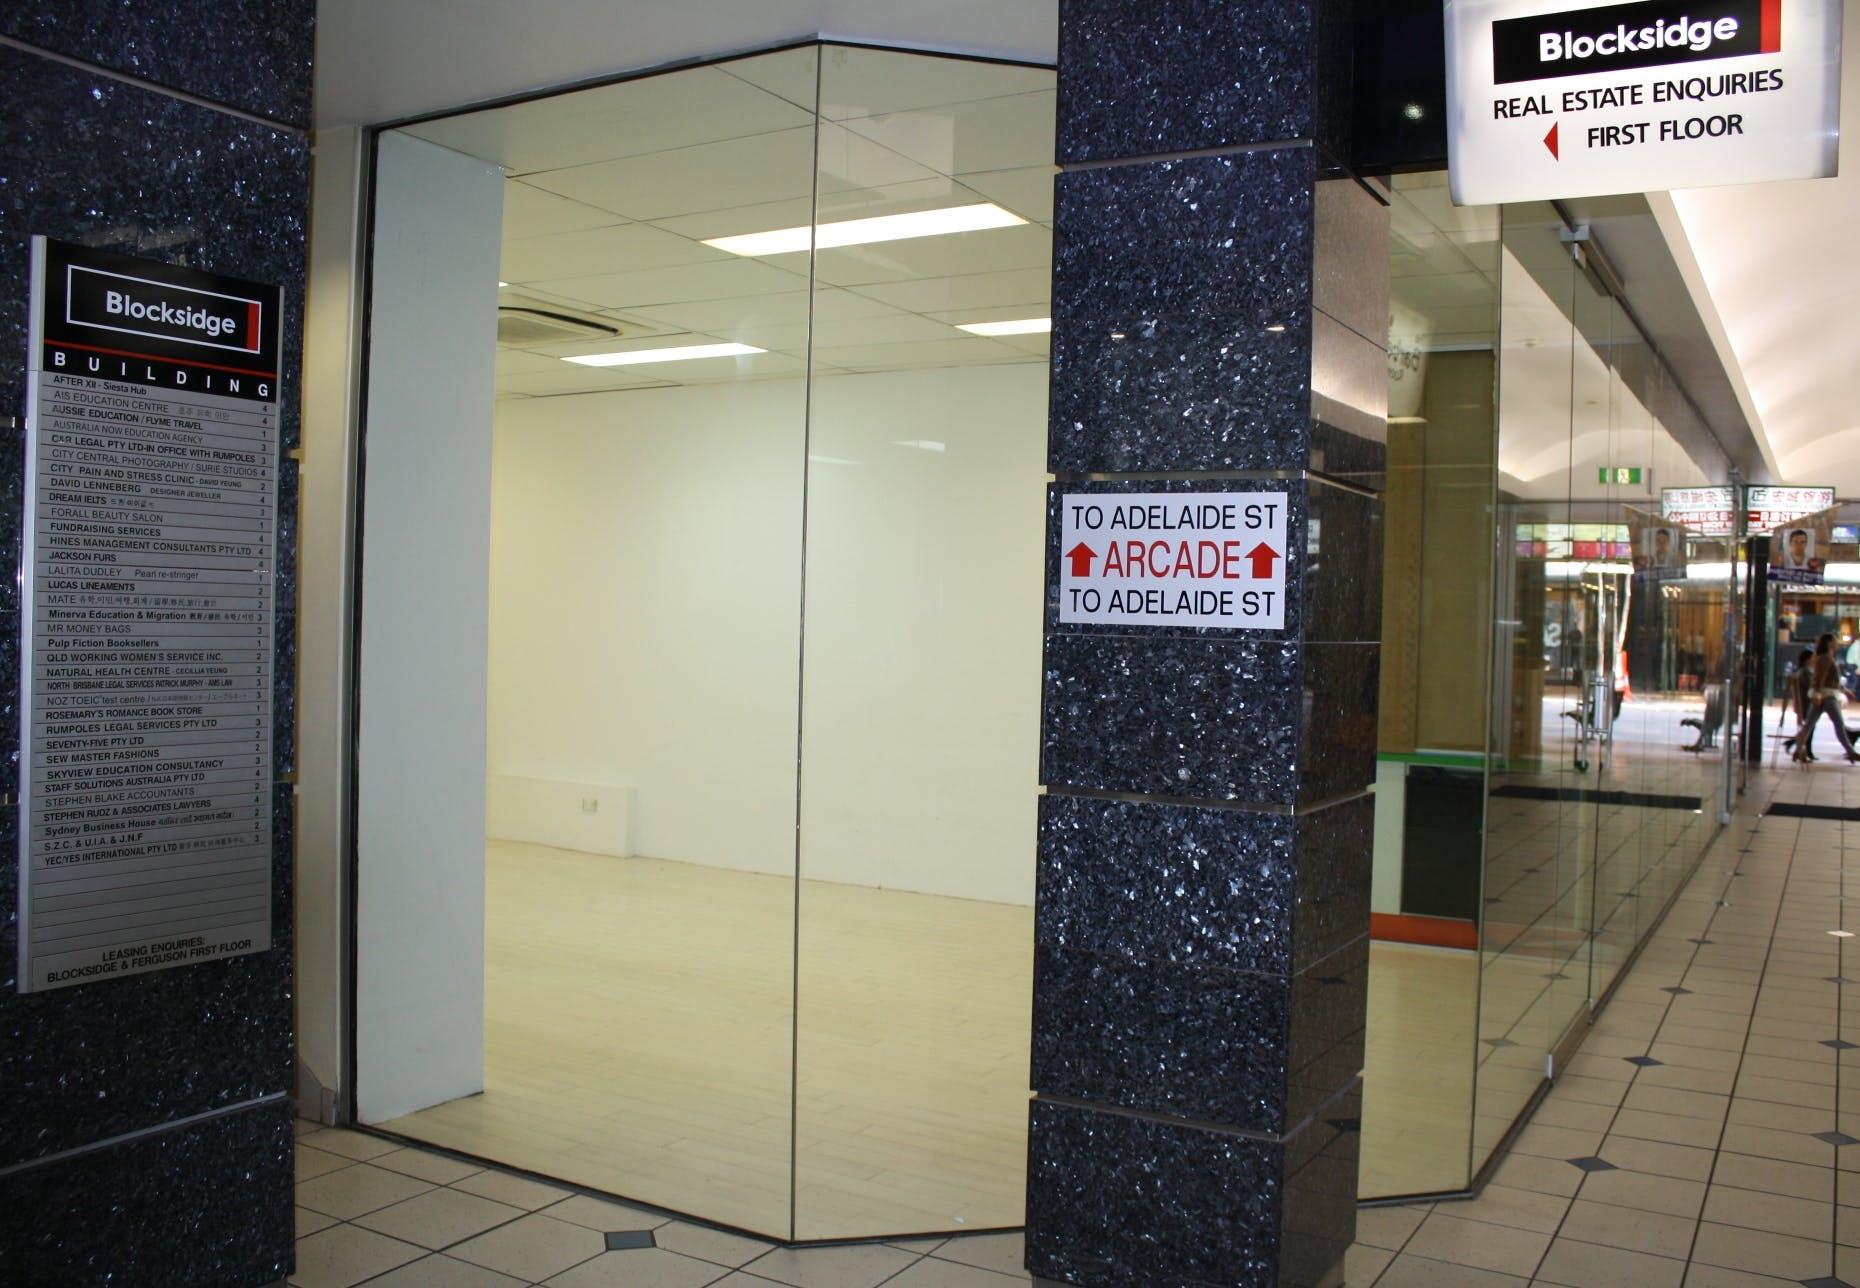 Shopfront at Blocksidge & Ferguson Arcade, image 2